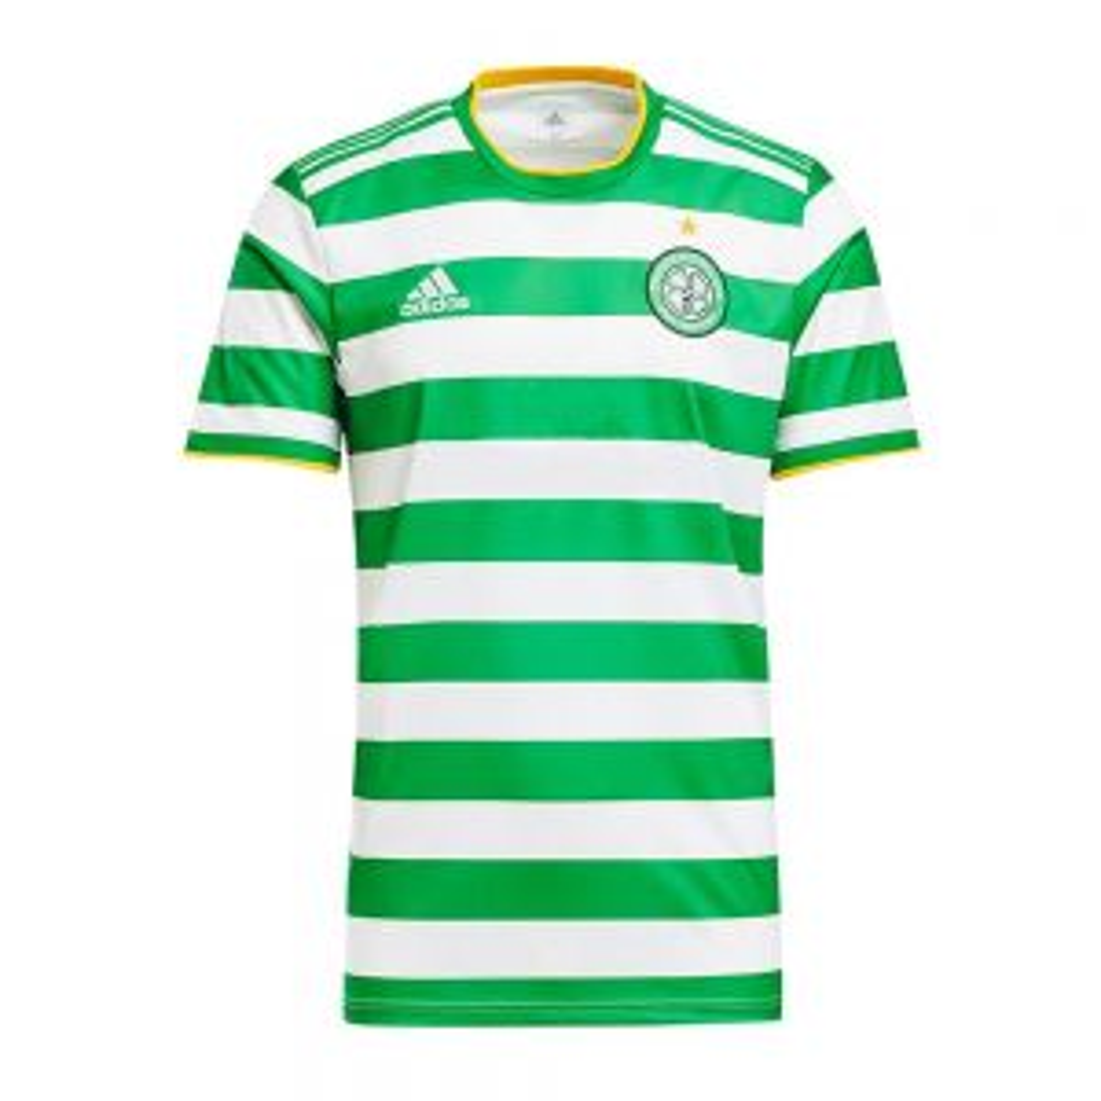 Celtic Mens 20/21 Home Shirt with No Sponsor - EUR version